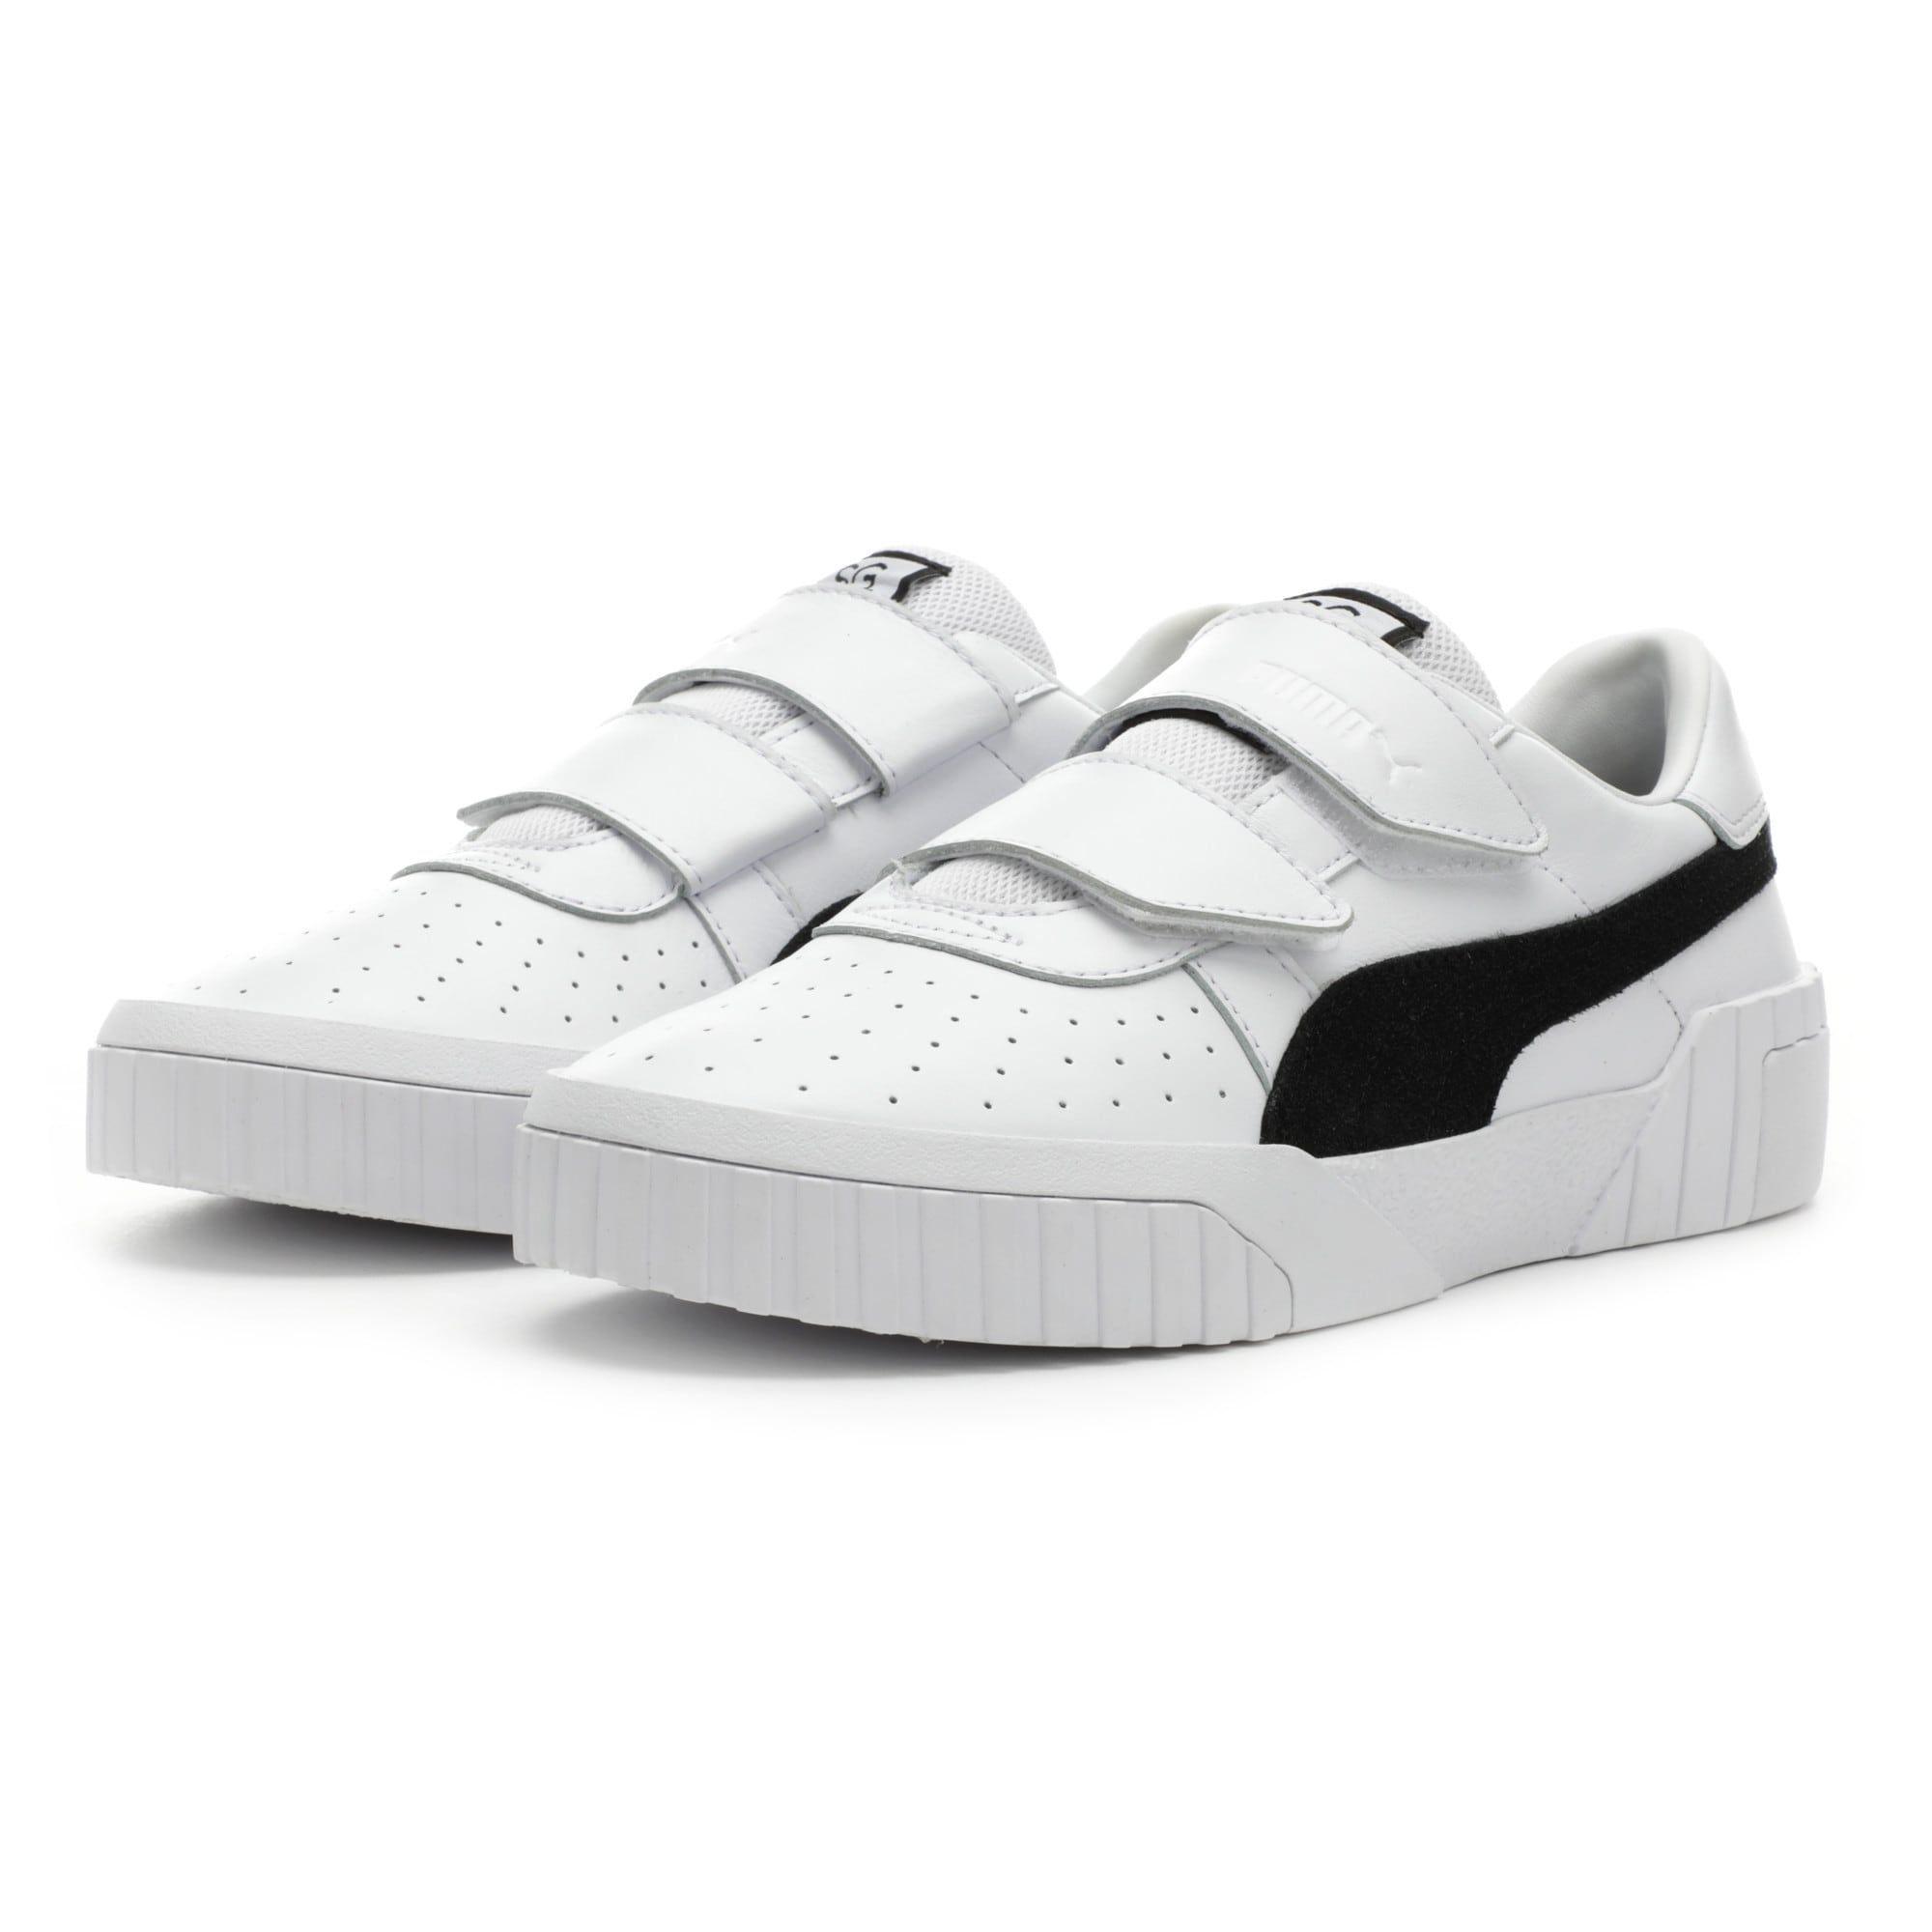 Puma Sneaker Cali Damen Schwarz Weiss Grosse 42 5 Puma Sneaker Sneaker Schuhe Damen